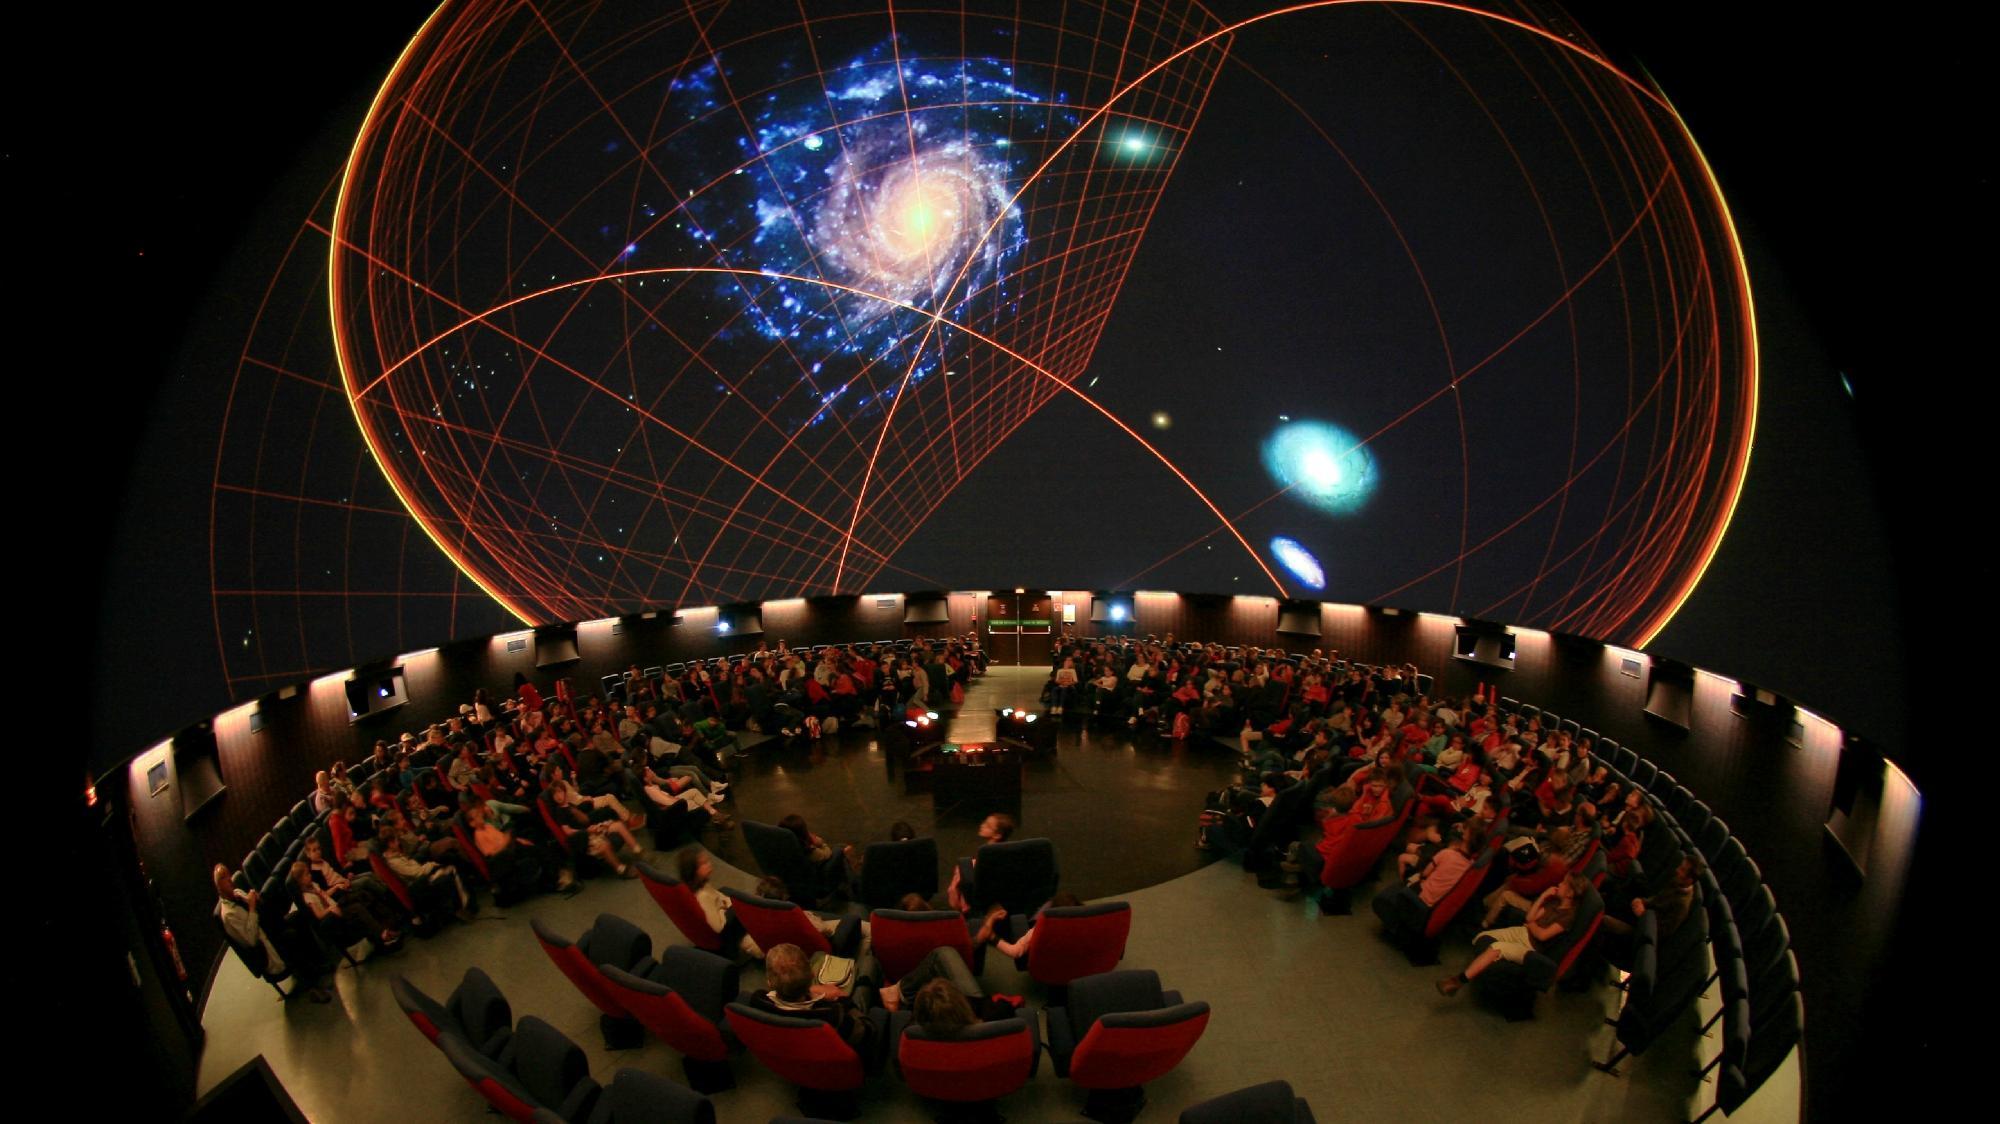 335-planetarium-de-bretagne.jpg